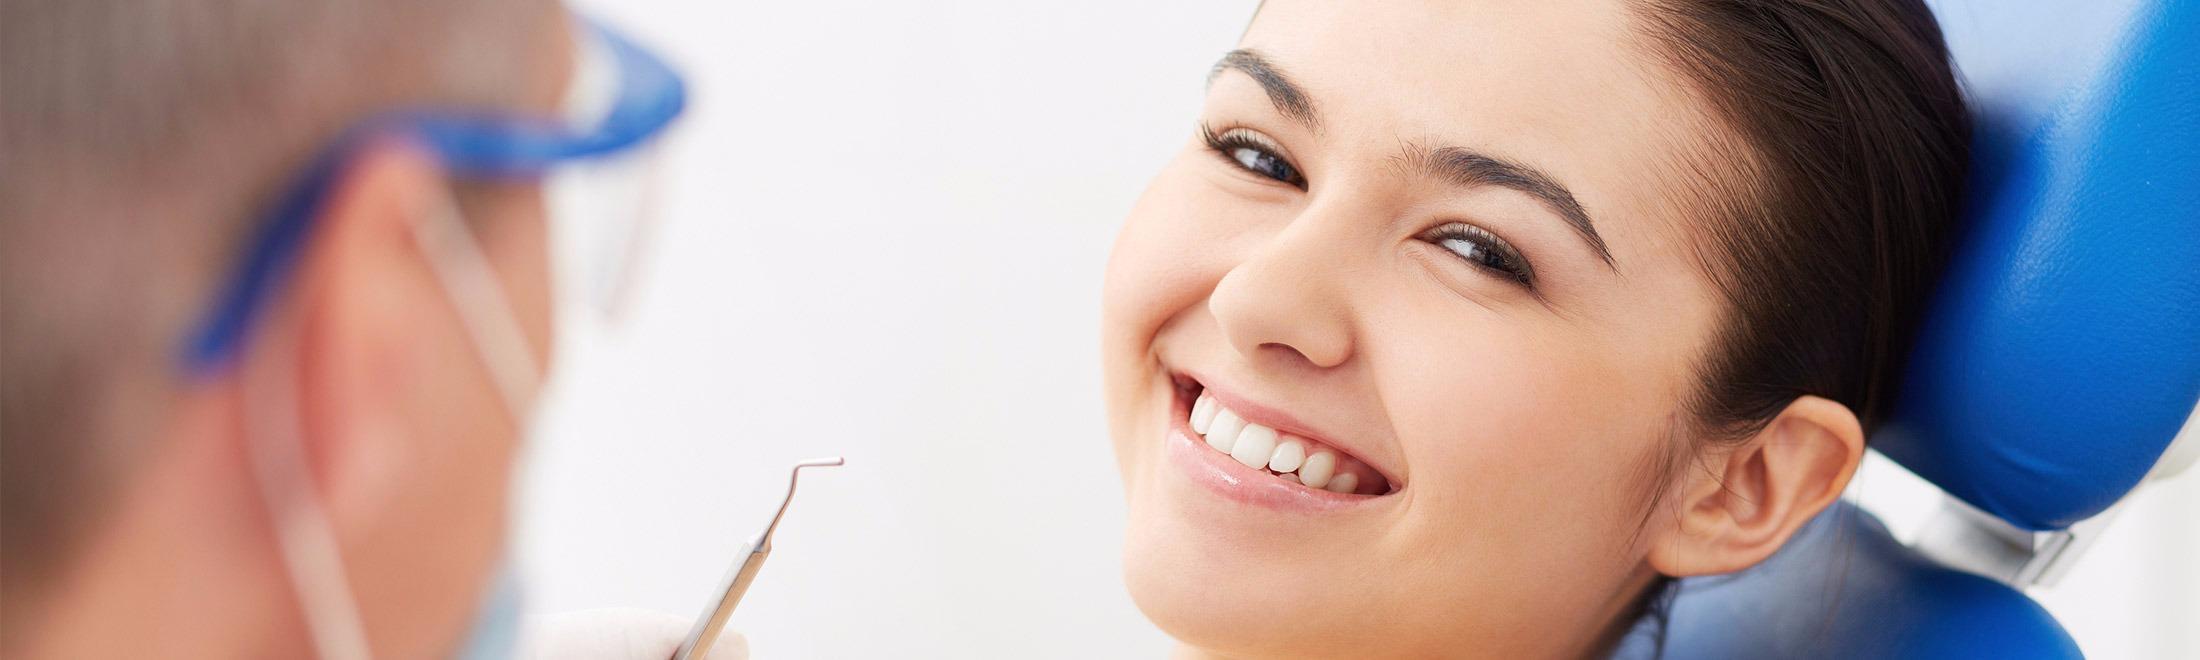 Eastside Dental Associates image 6